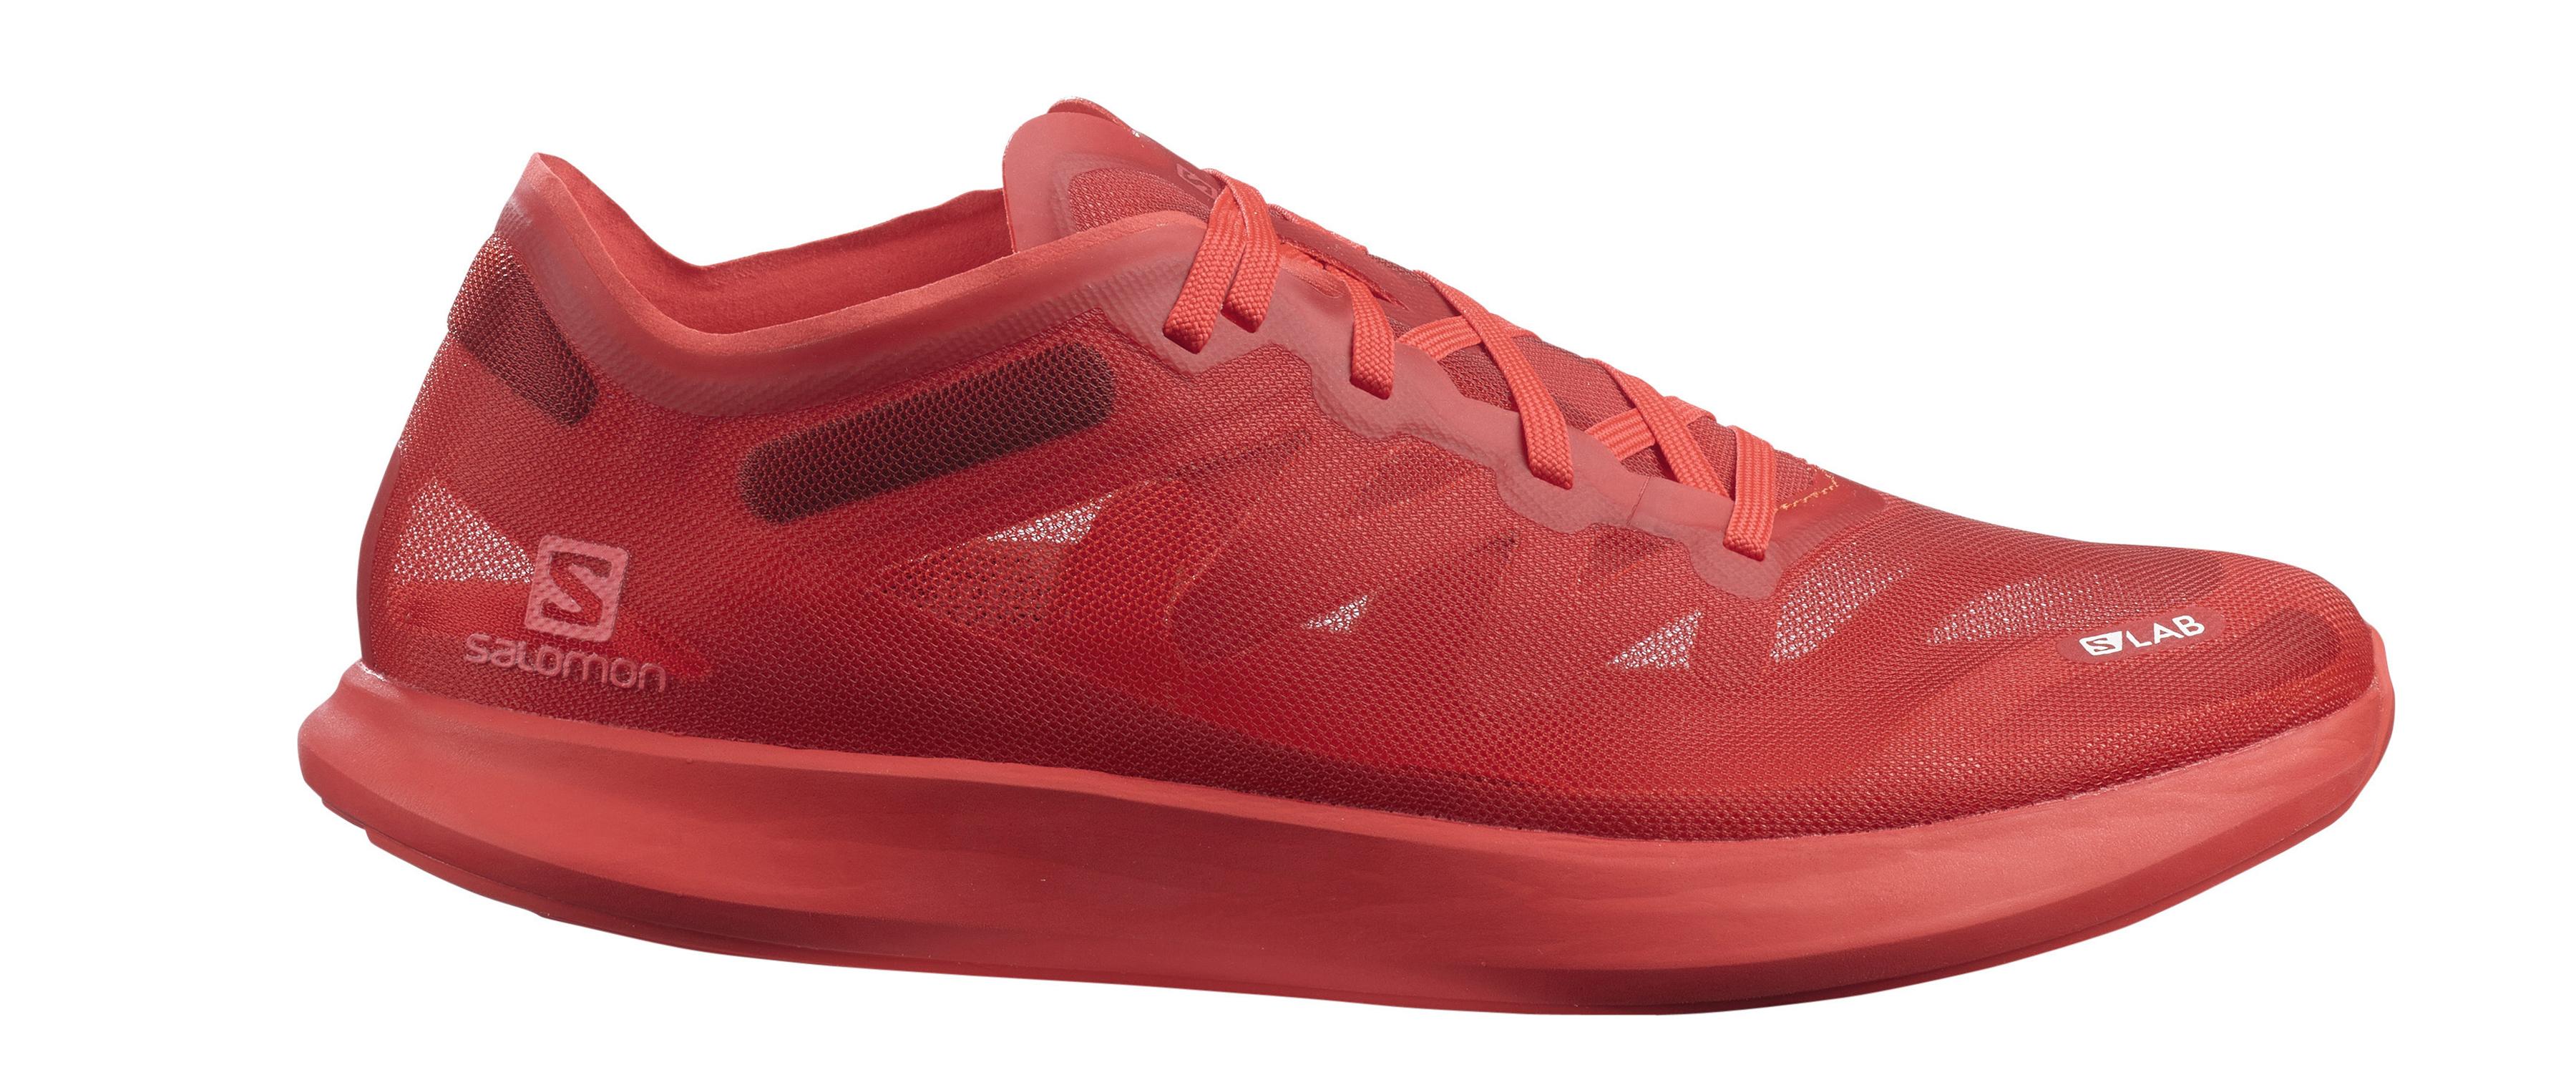 Salomon S/LAB Phantasm Running Shoes